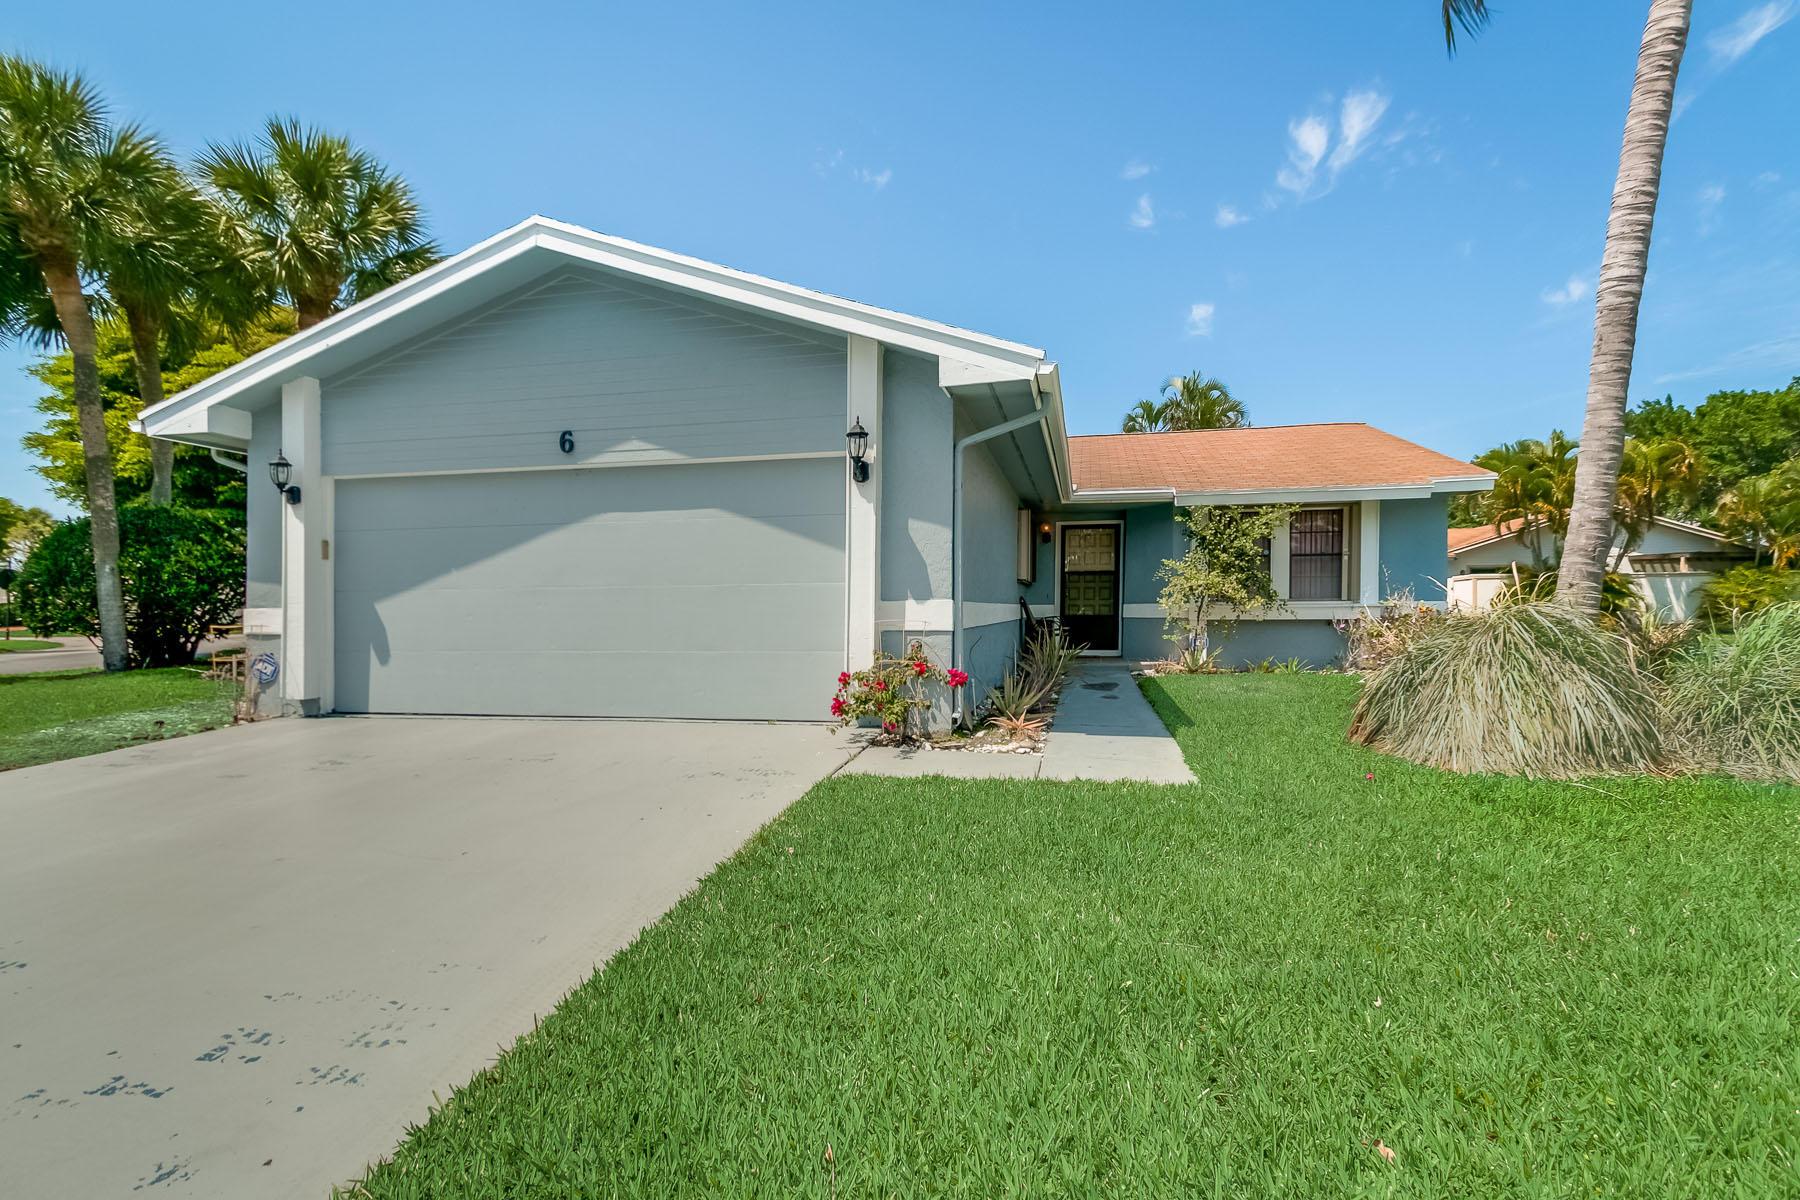 6 Boswell Place Boynton Beach, FL 33426